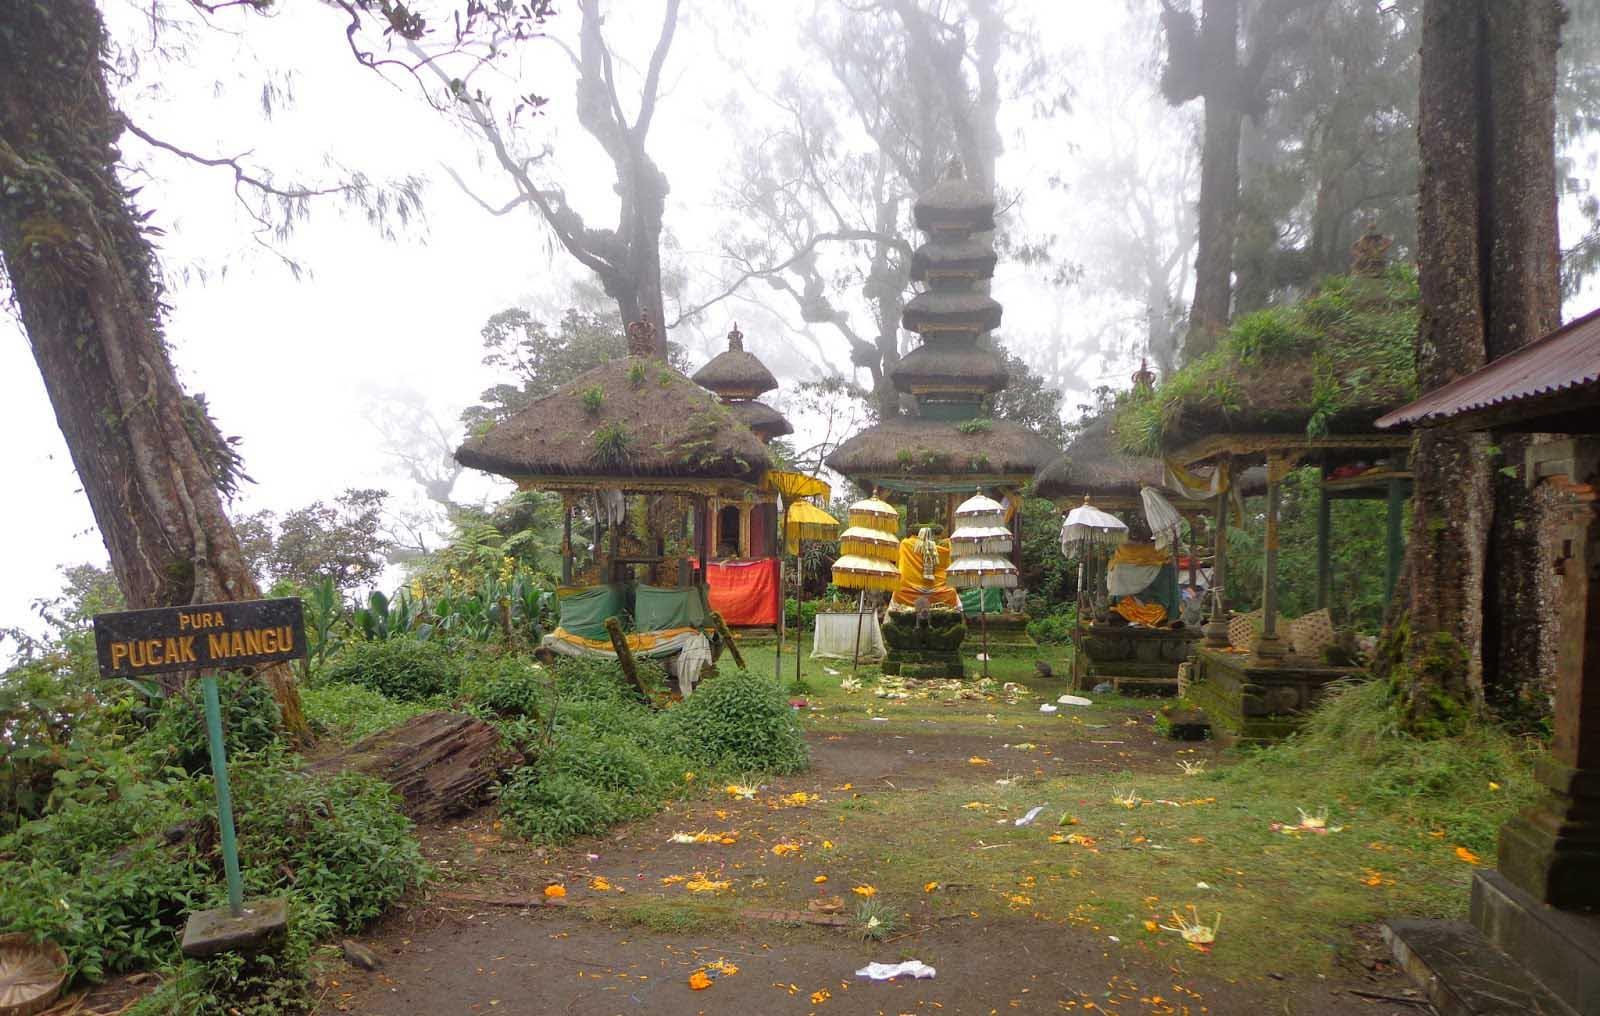 Resting above Lake Bratan atop the summit rim of Gunung Catur, Pura Pucak Mangu is another one of Ba